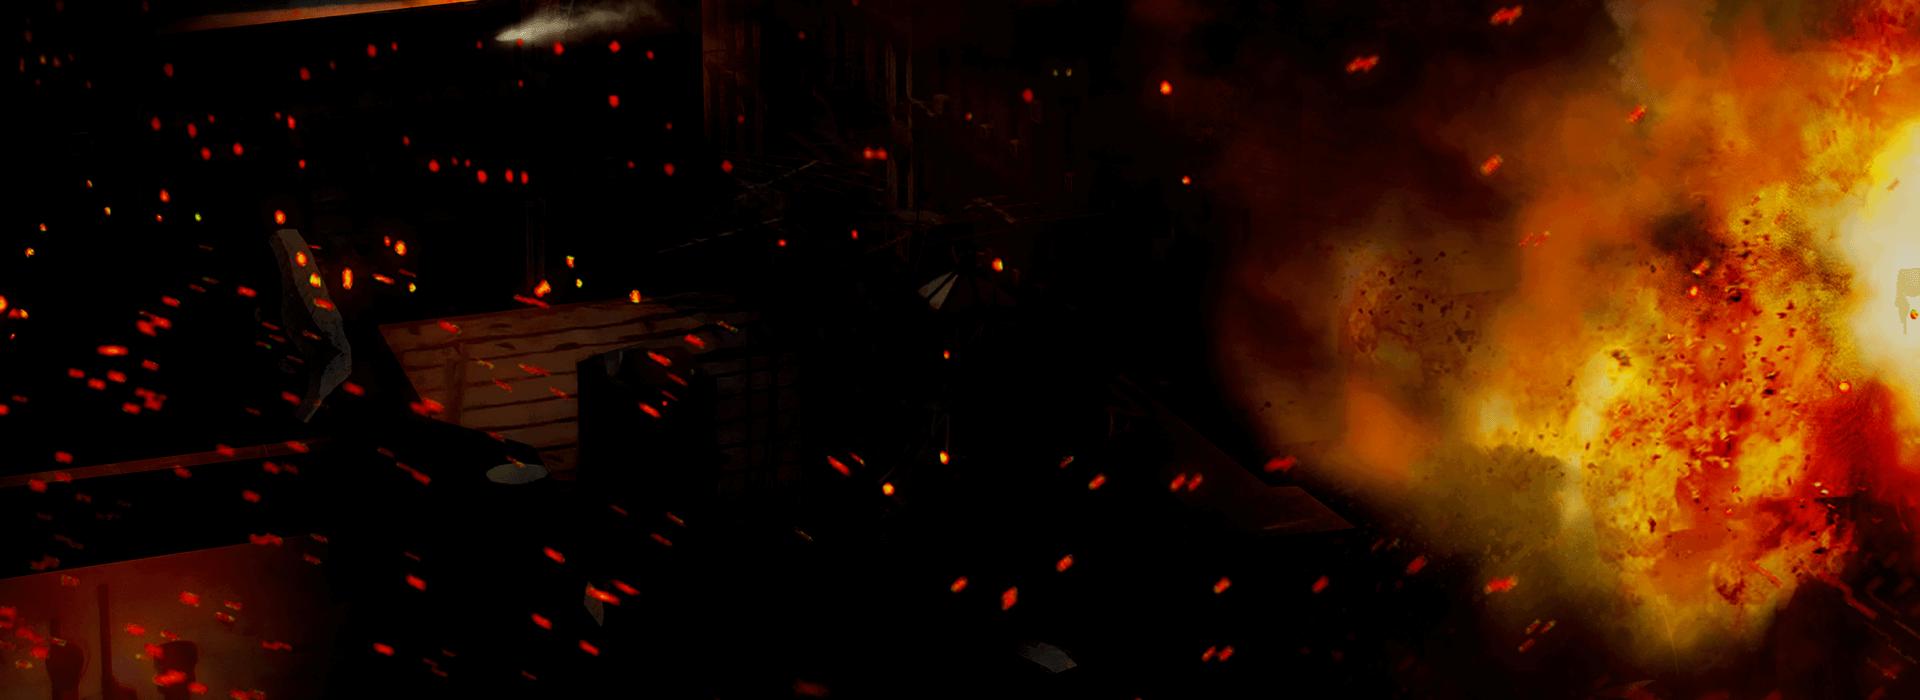 cwbots background